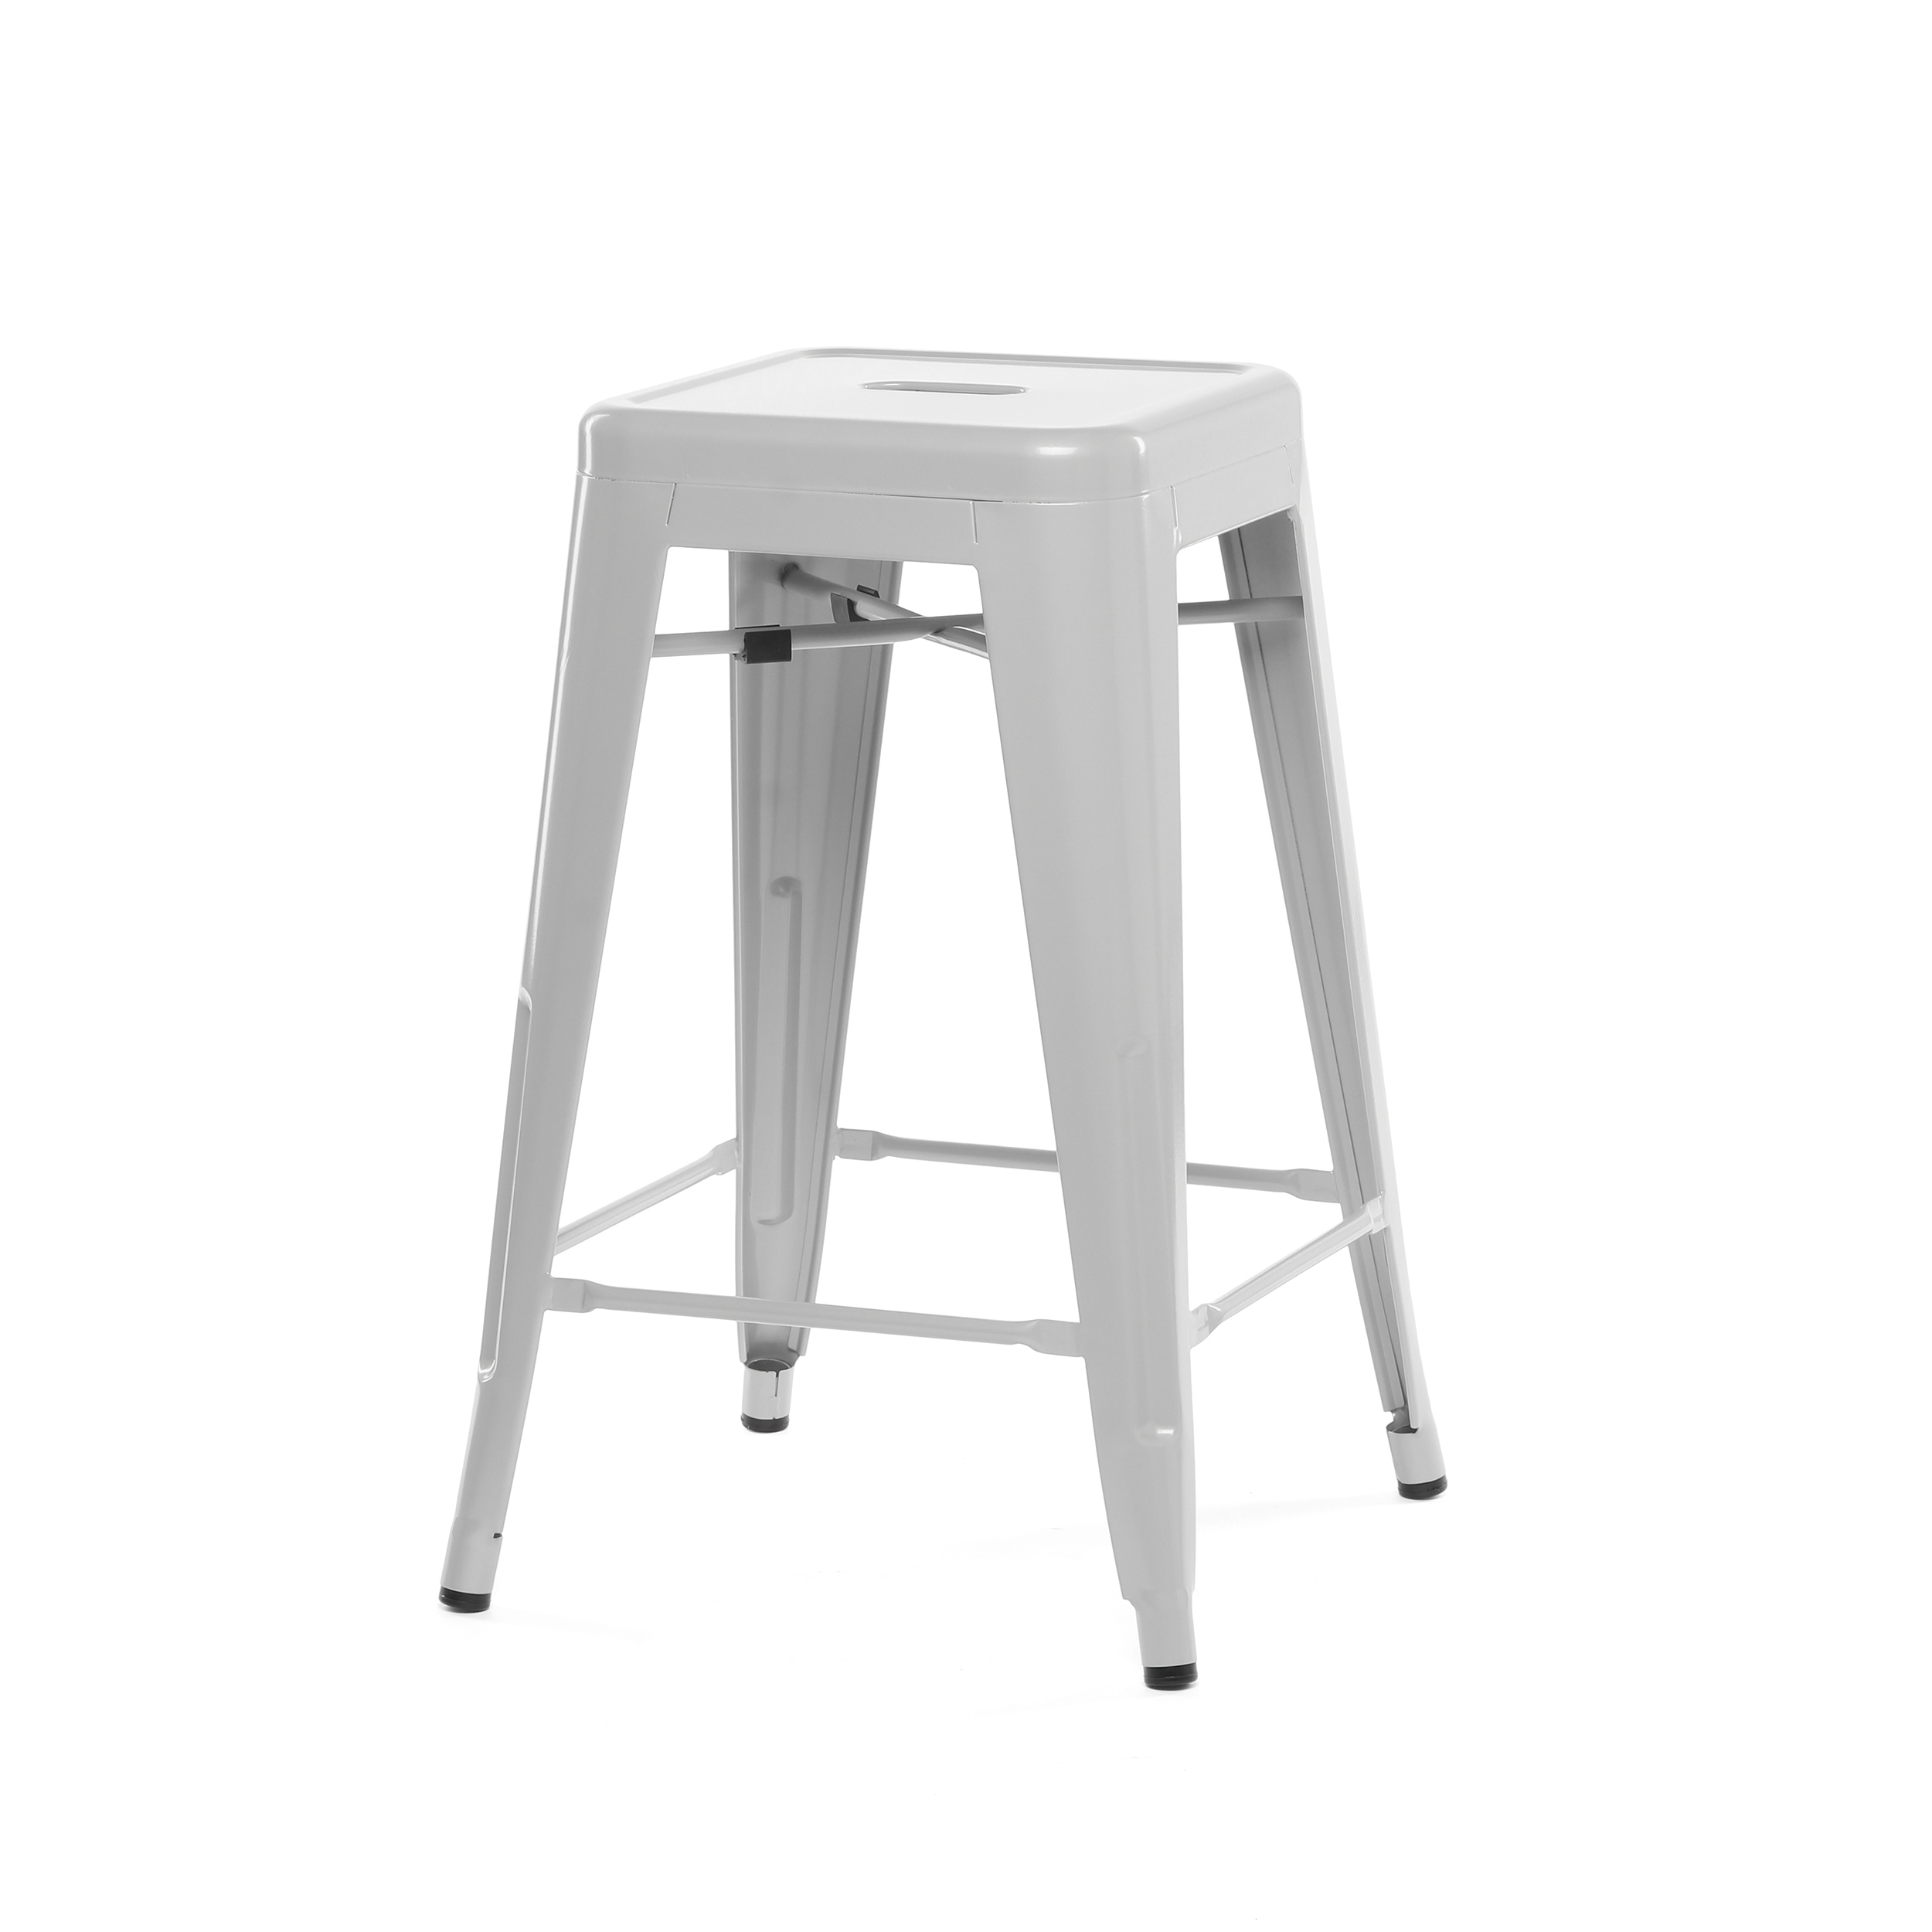 Полубарный стул MC-010Полубарные<br><br><br>stock: 24<br>Высота: 61<br>Ширина: 41<br>Глубина: 41<br>Тип материала каркаса: Сталь<br>Цвет каркаса: Серый